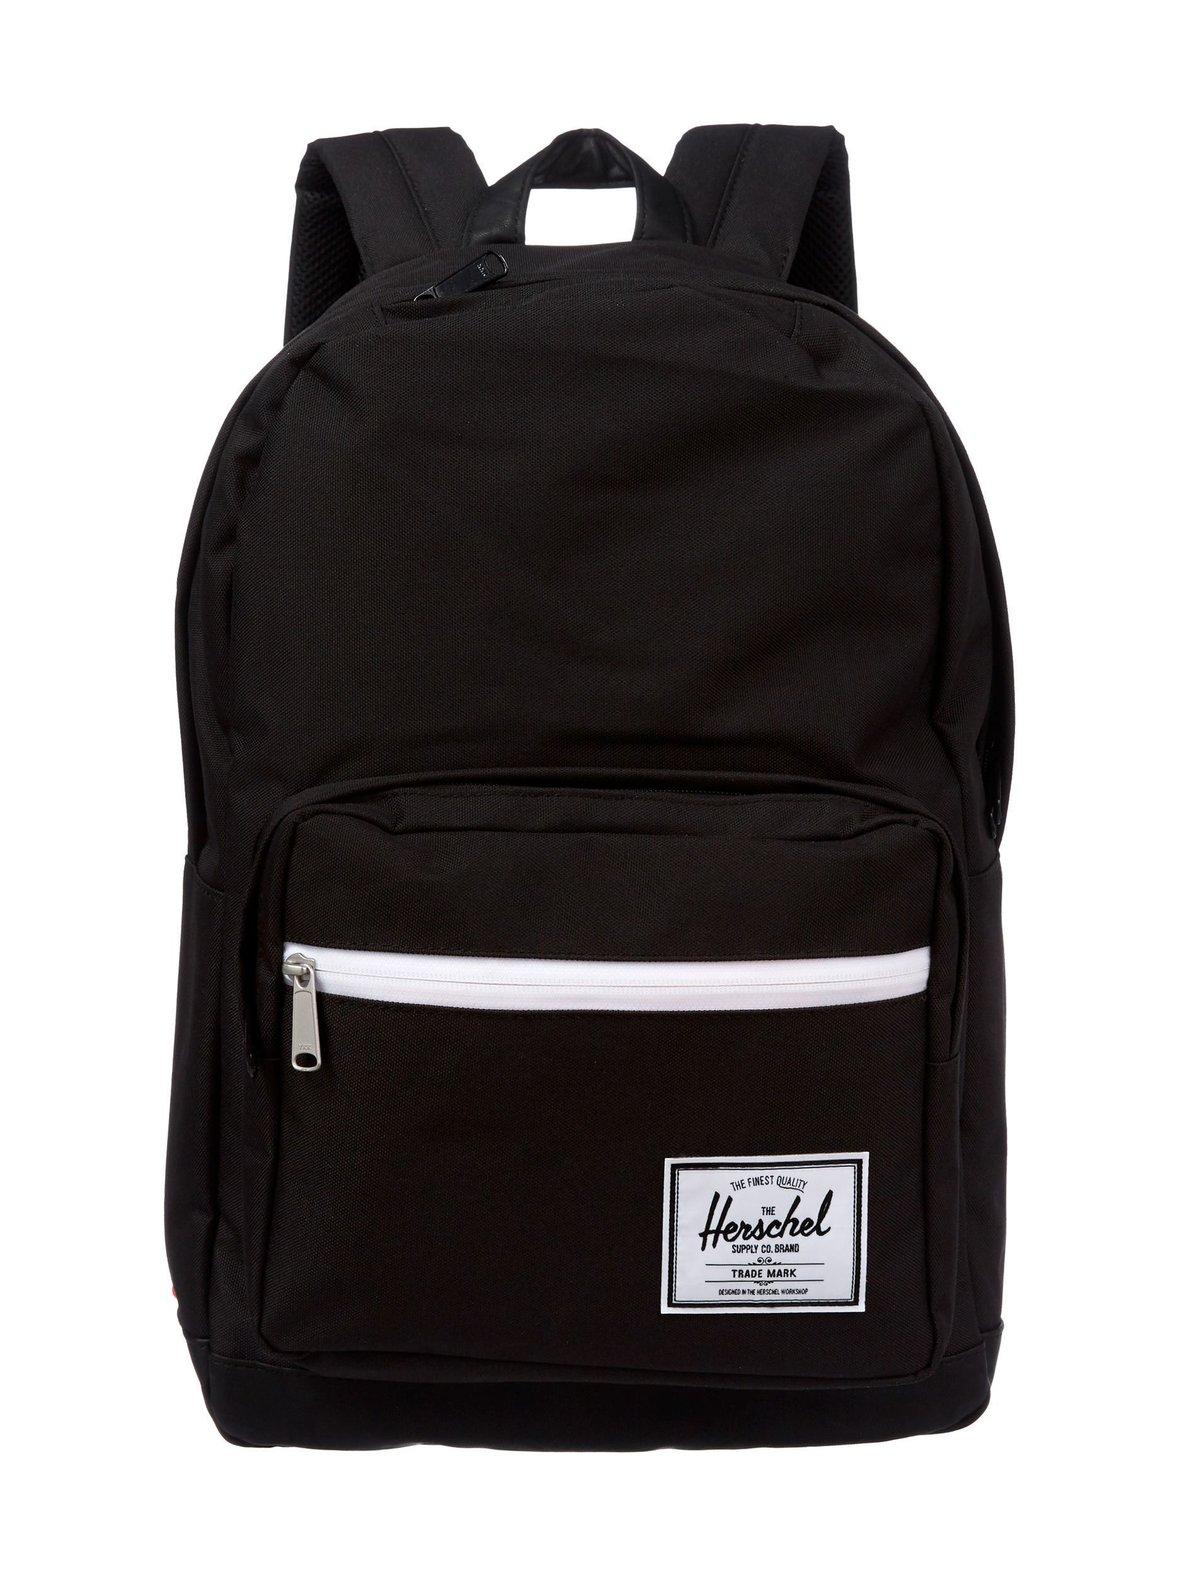 Black (musta) Herschel Supply Co. Pop Quiz -reppu 22 l 10011  978ed95c62